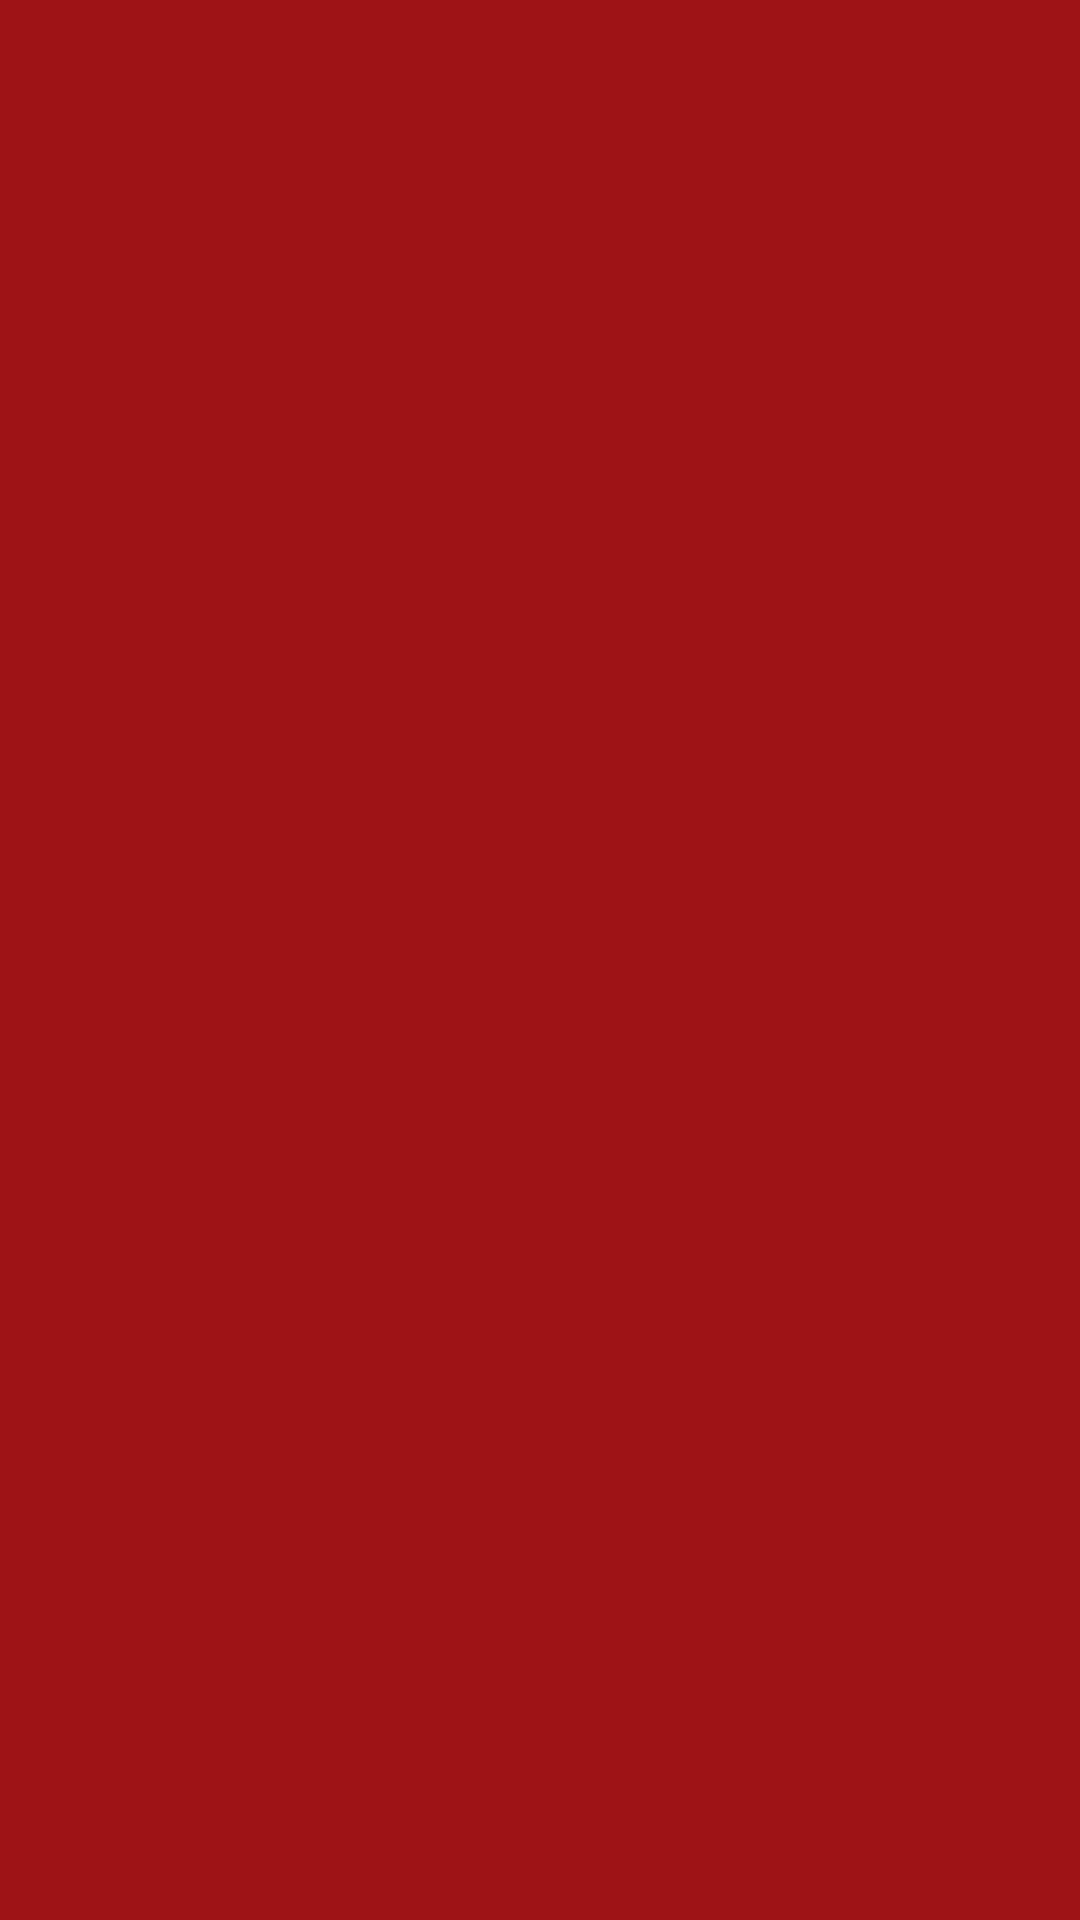 1080x1920 Spartan Crimson Solid Color Background